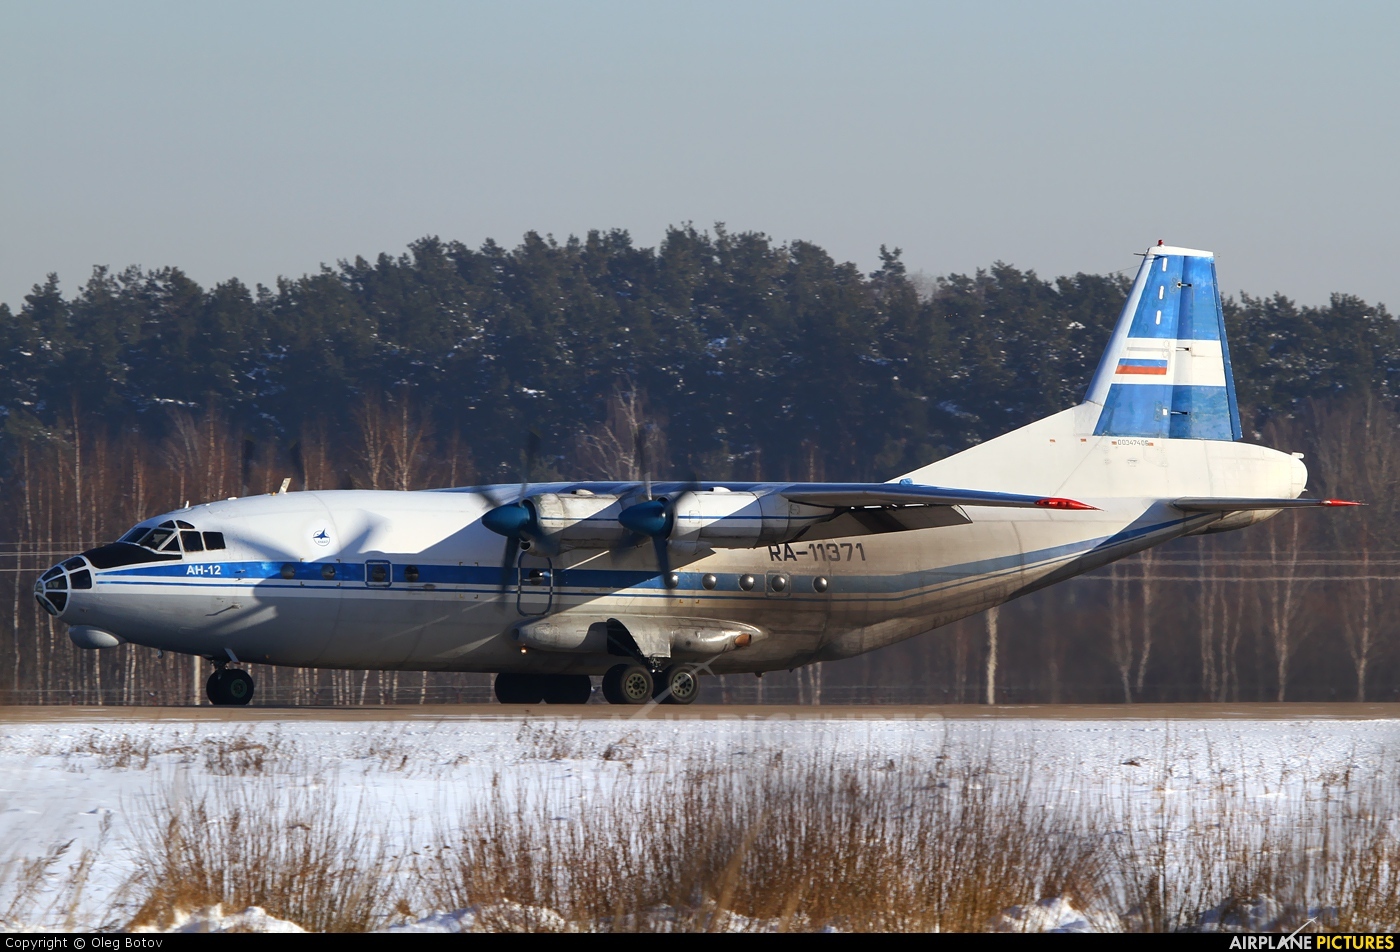 KNAAPO RA-11371 aircraft at Ramenskoye - Zhukovsky